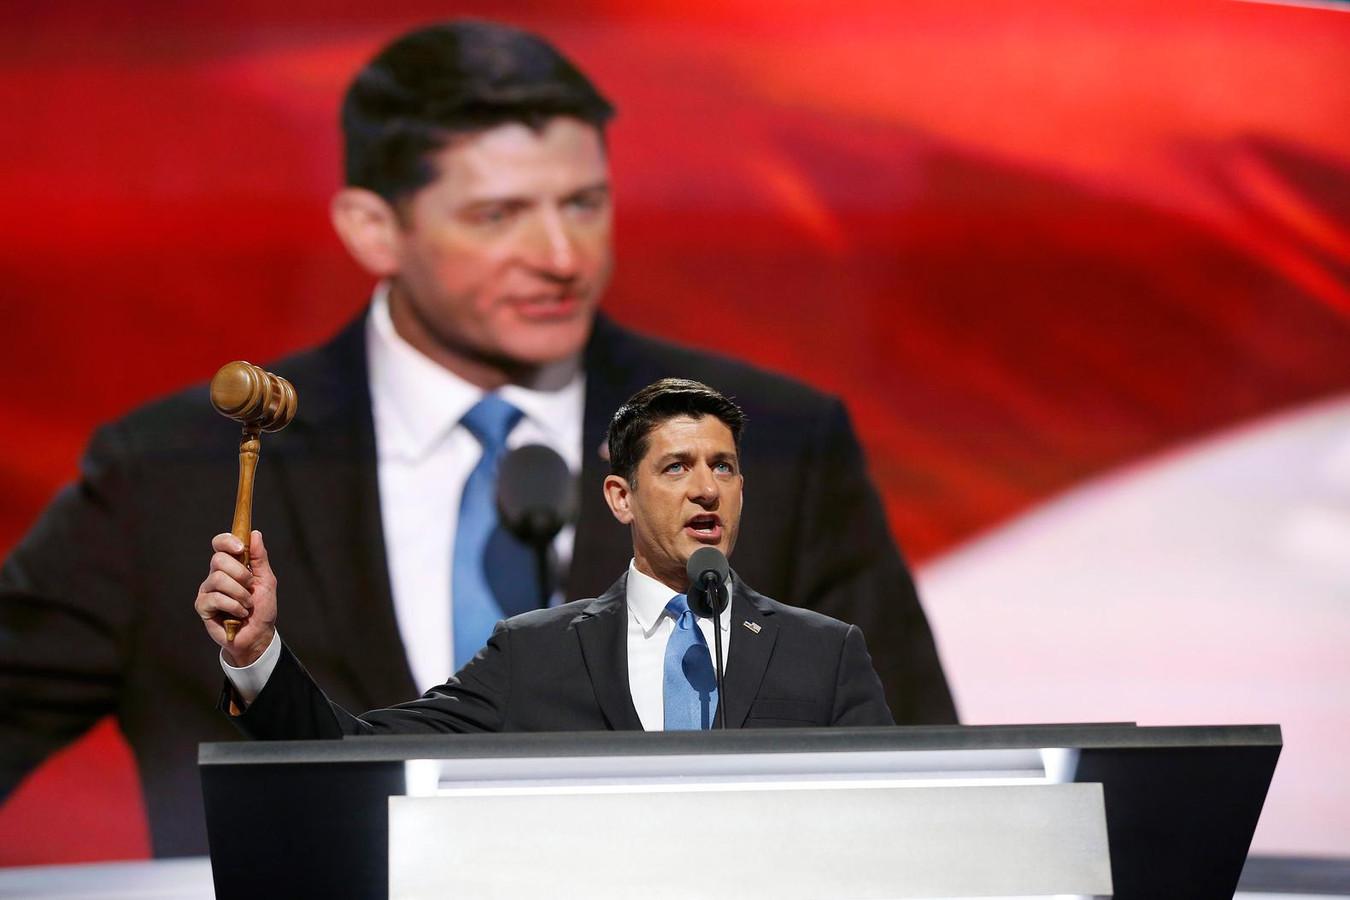 Donald Trump steunt Paul Ryan toch | Foto | AD.nl